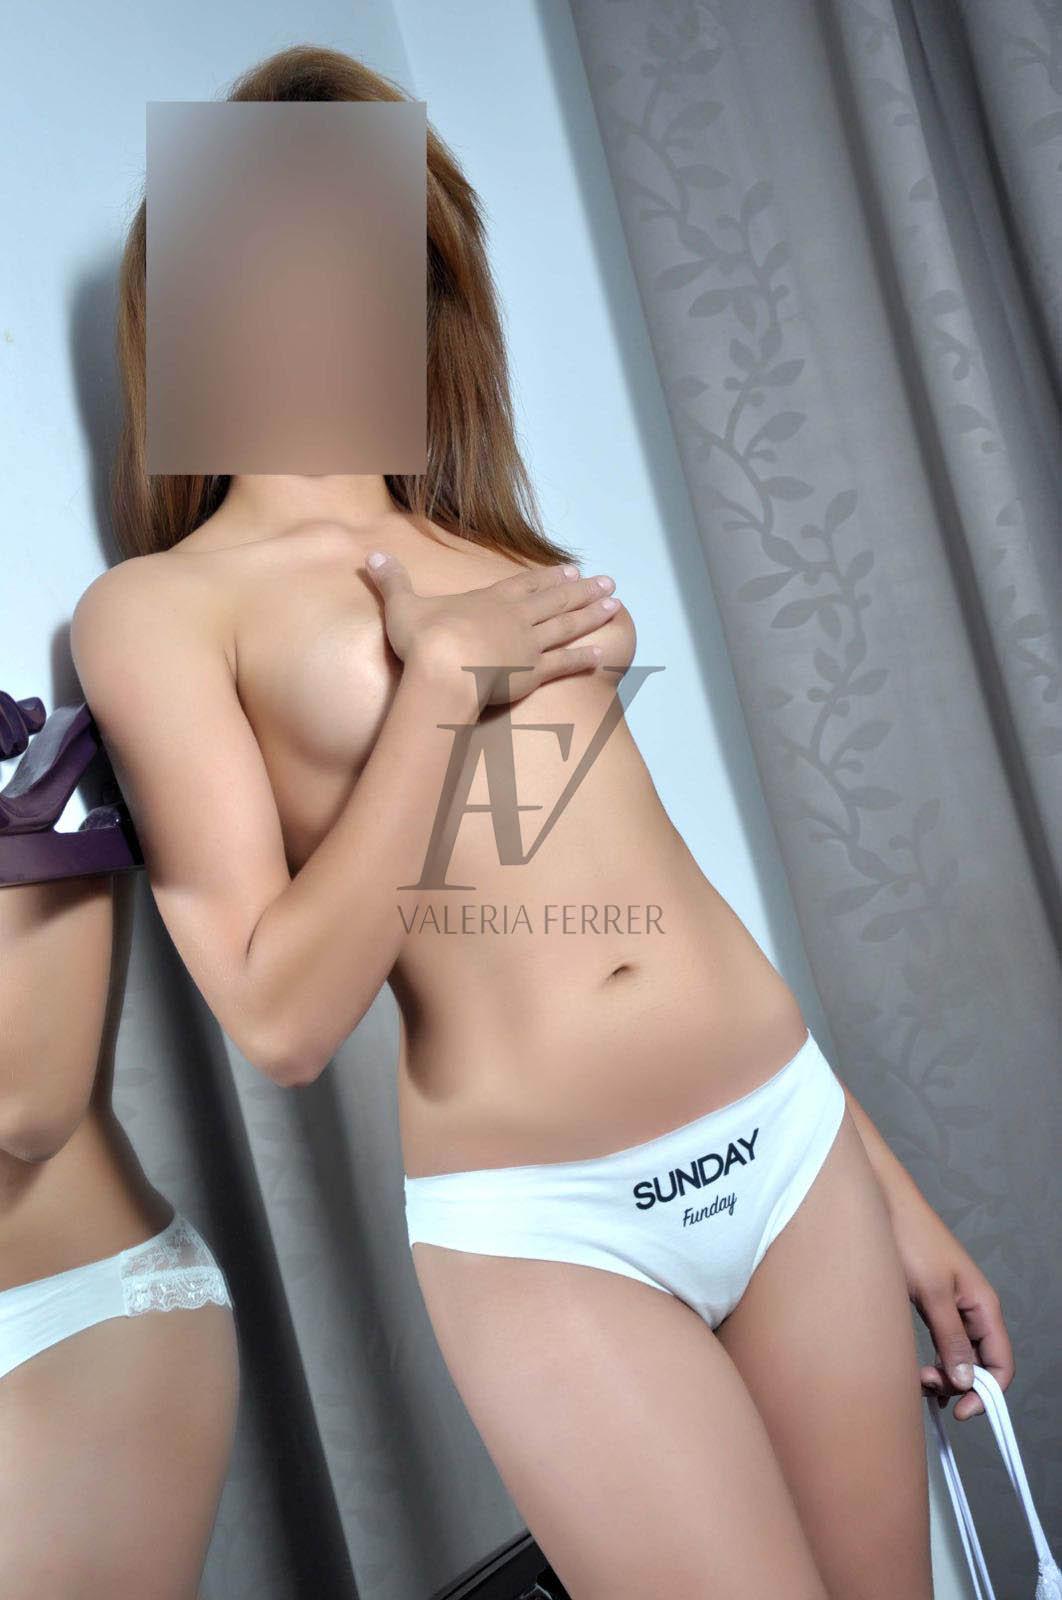 agencia de modelos acompañantes gay escort valencia